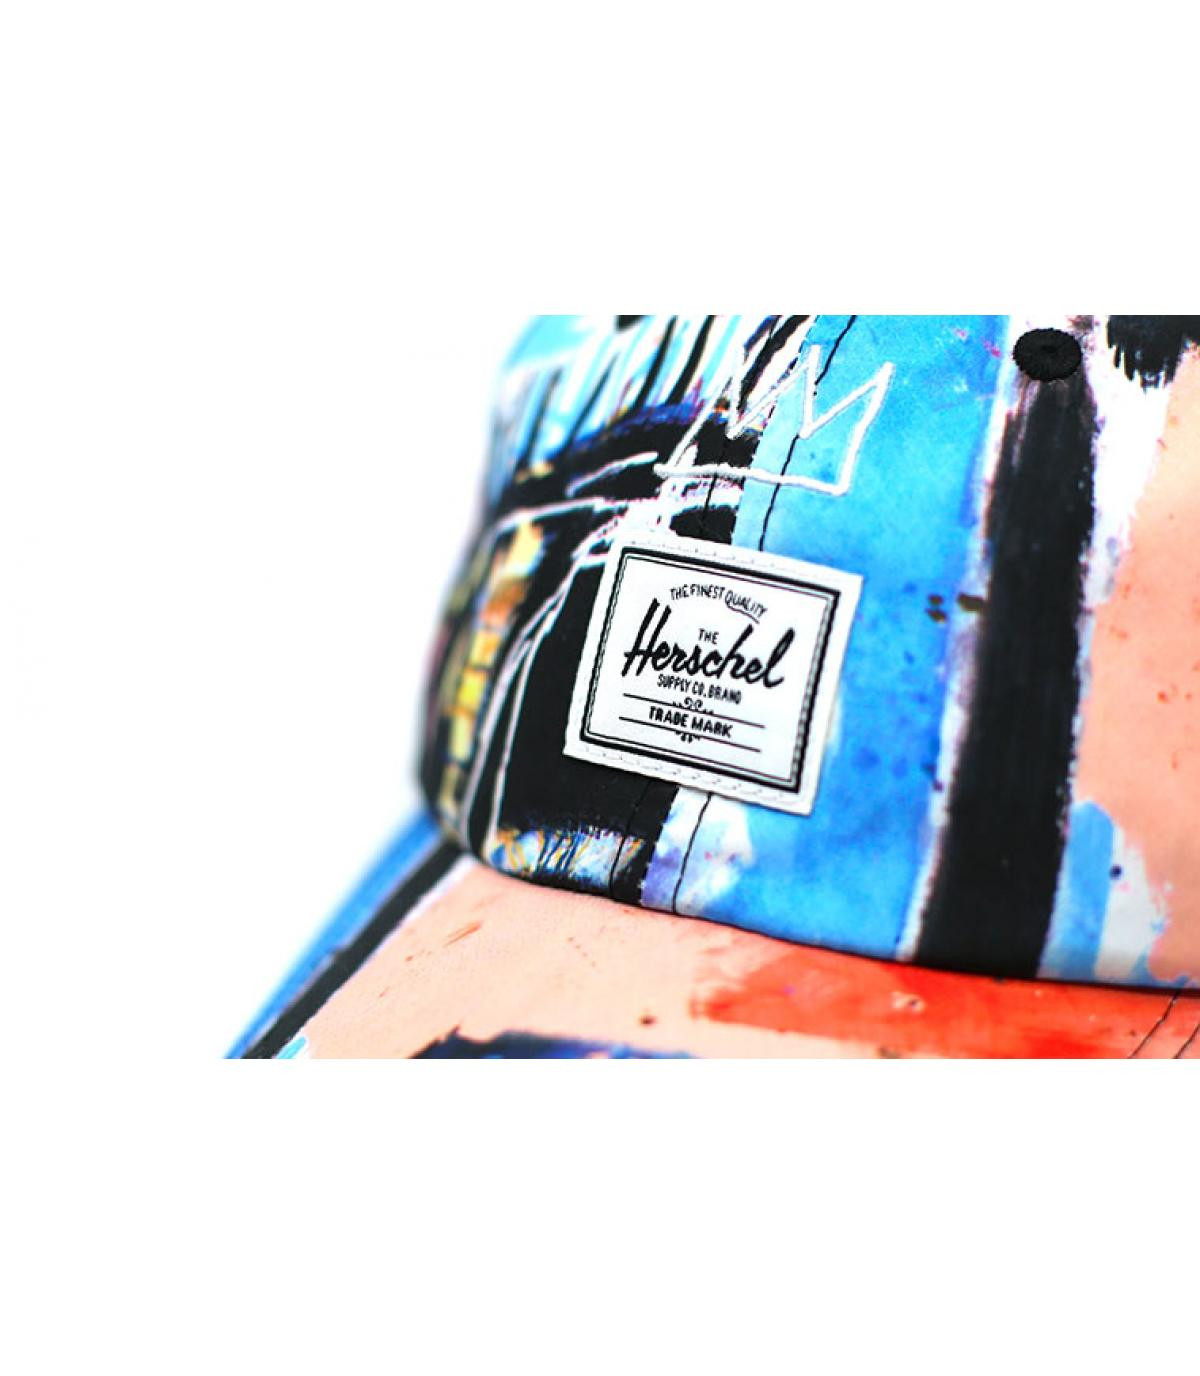 Detalles Curve Basquiat Mosby Voyage imagen 3